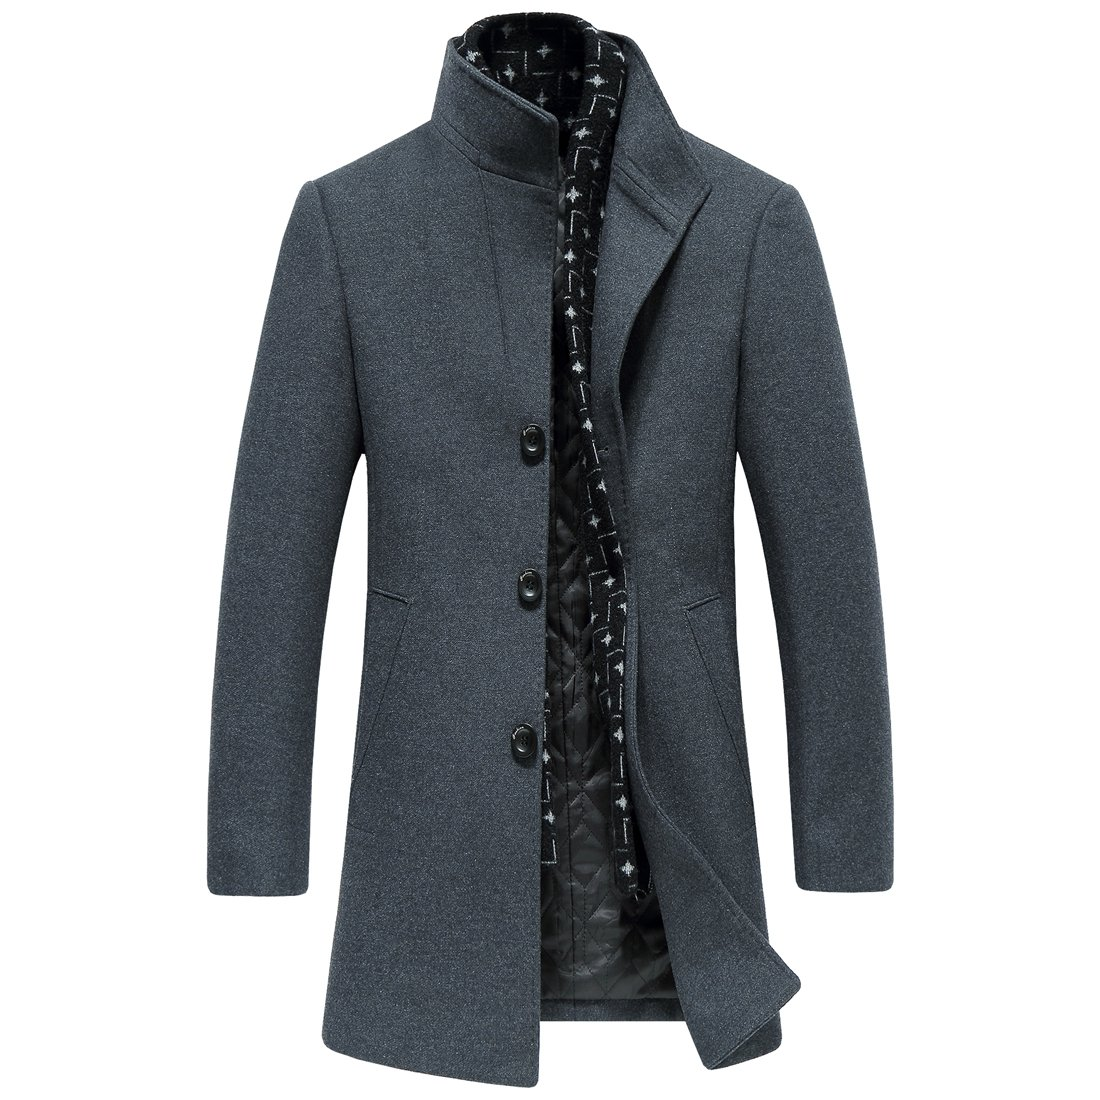 Men's Wool Long Trench Coat Winter Wool Blends Tweed Jackets Warm With Detachable Scarf (XXXL, 8725GREY)